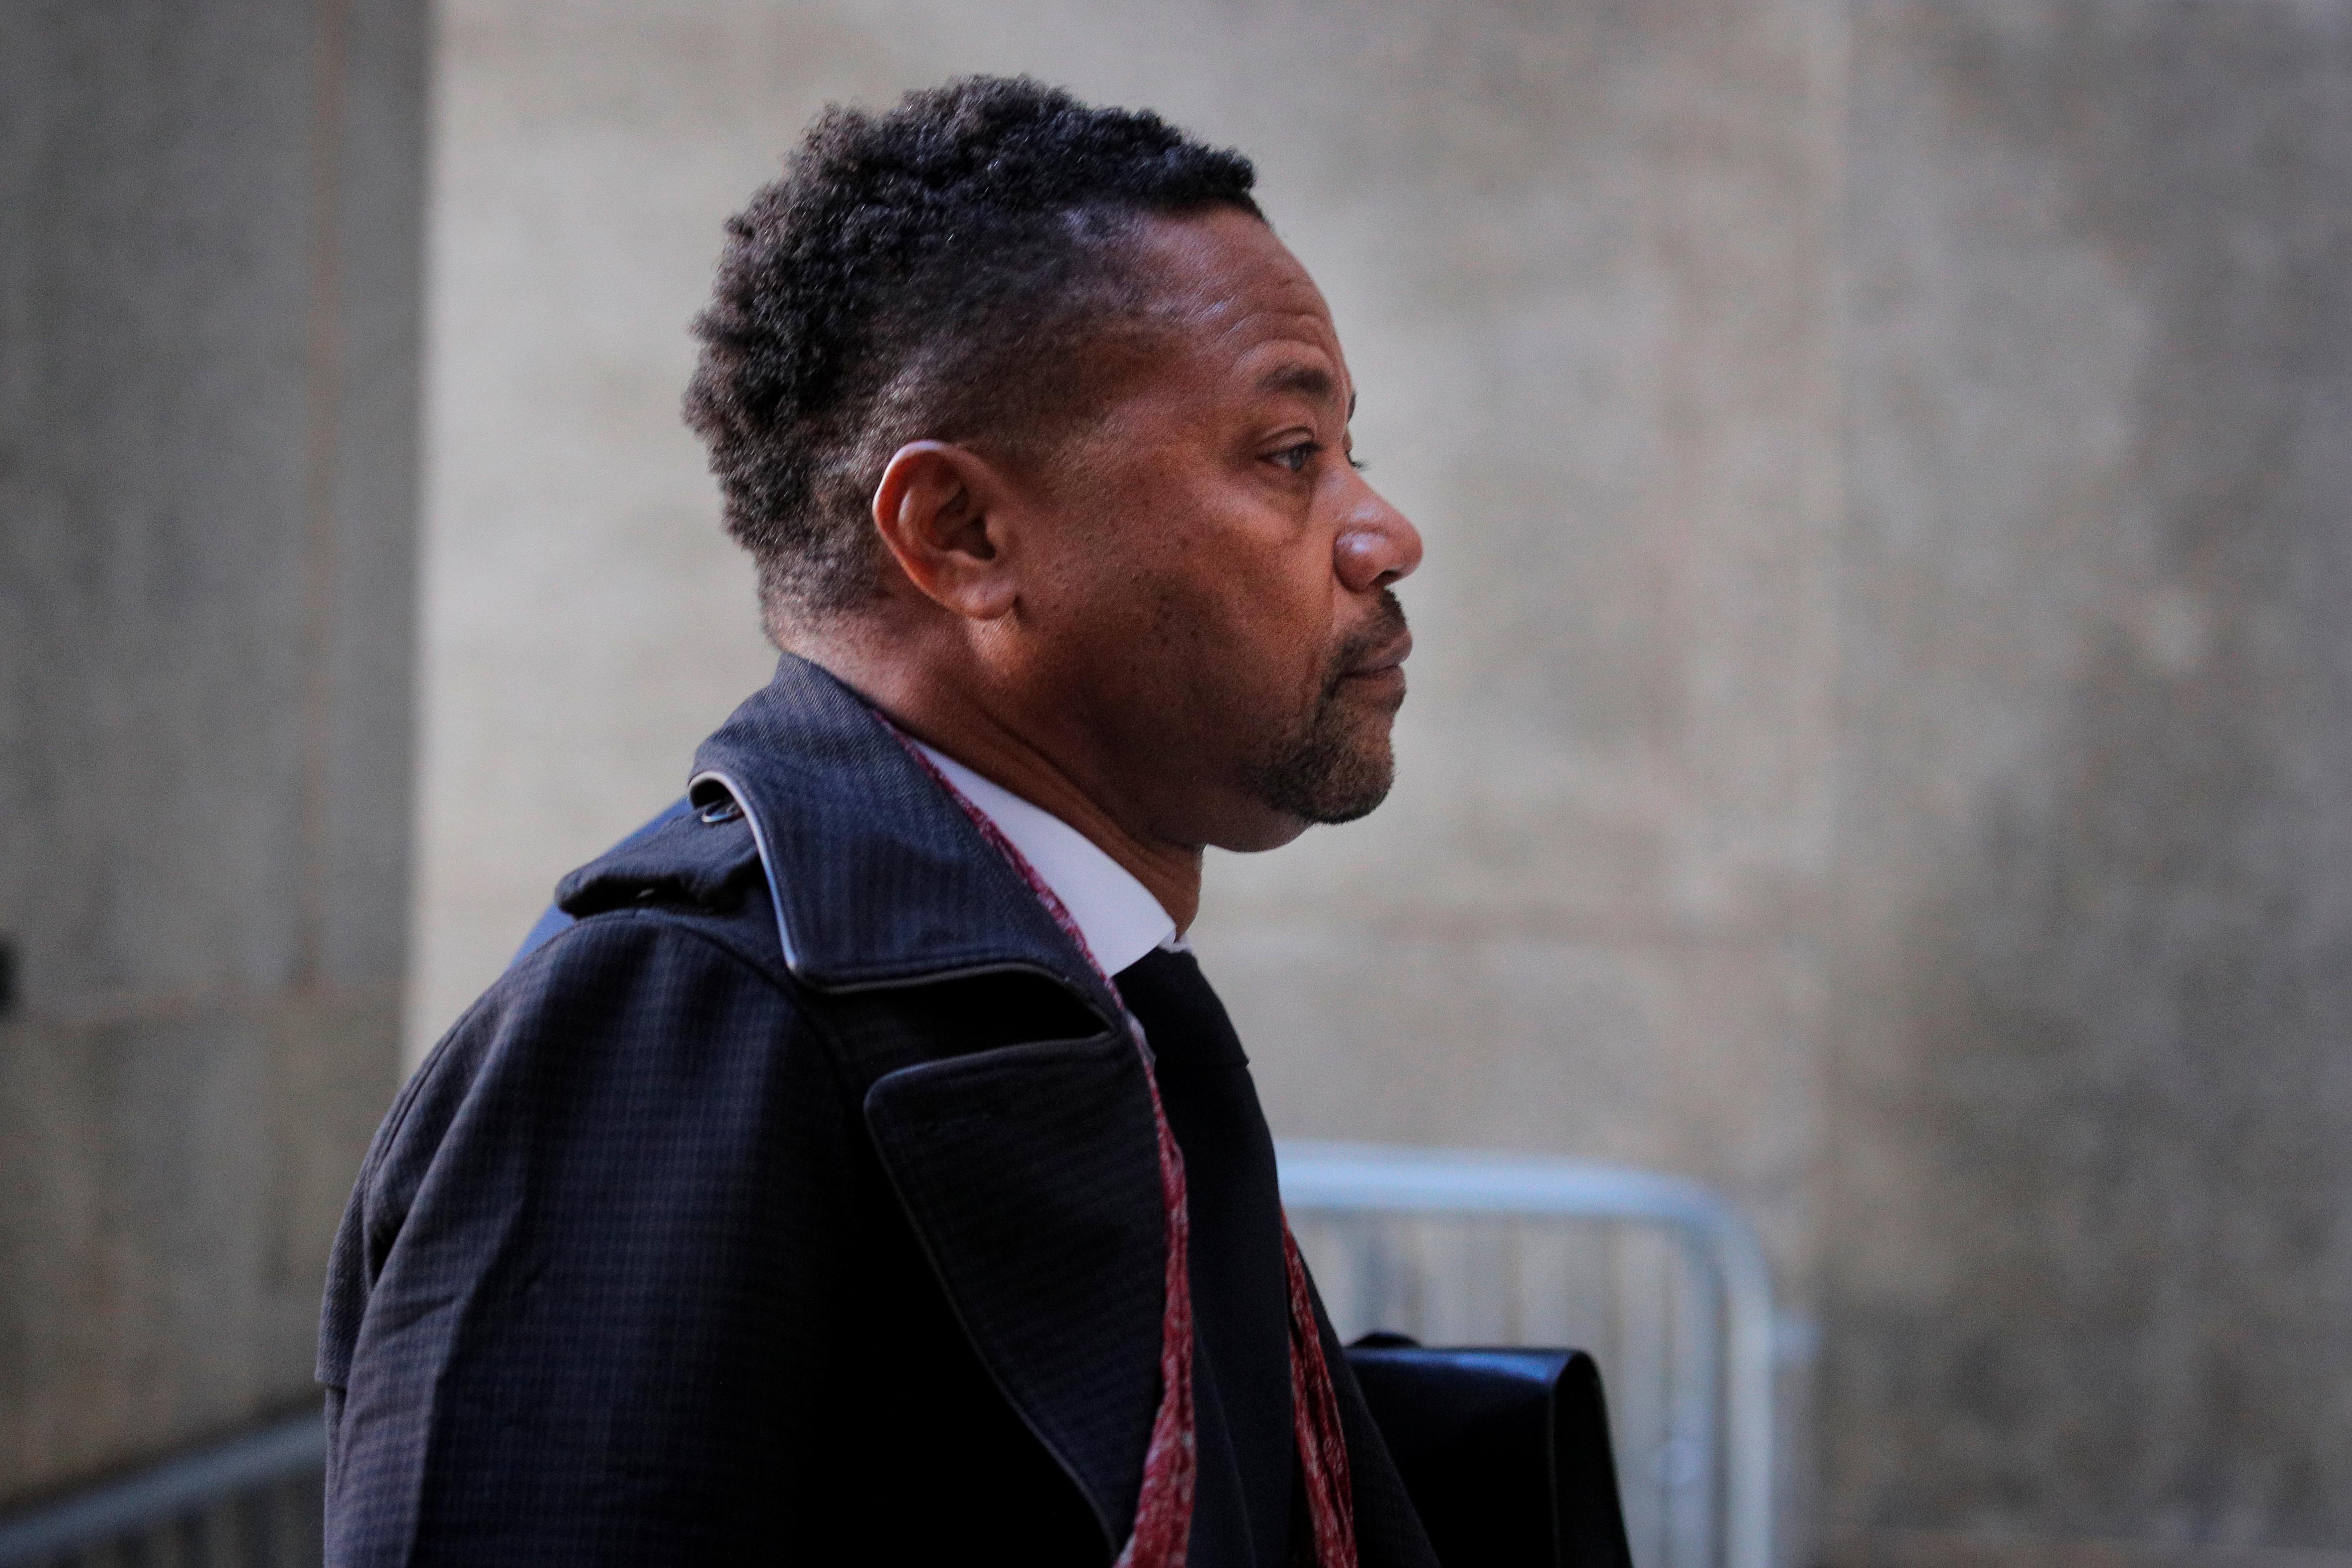 Actor Cuba Gooding Jr. arrives at New York Criminal Court in Manhattan borough of New York City, New York, U.S., January 22, 2020. REUTERS/Brendan McDermid